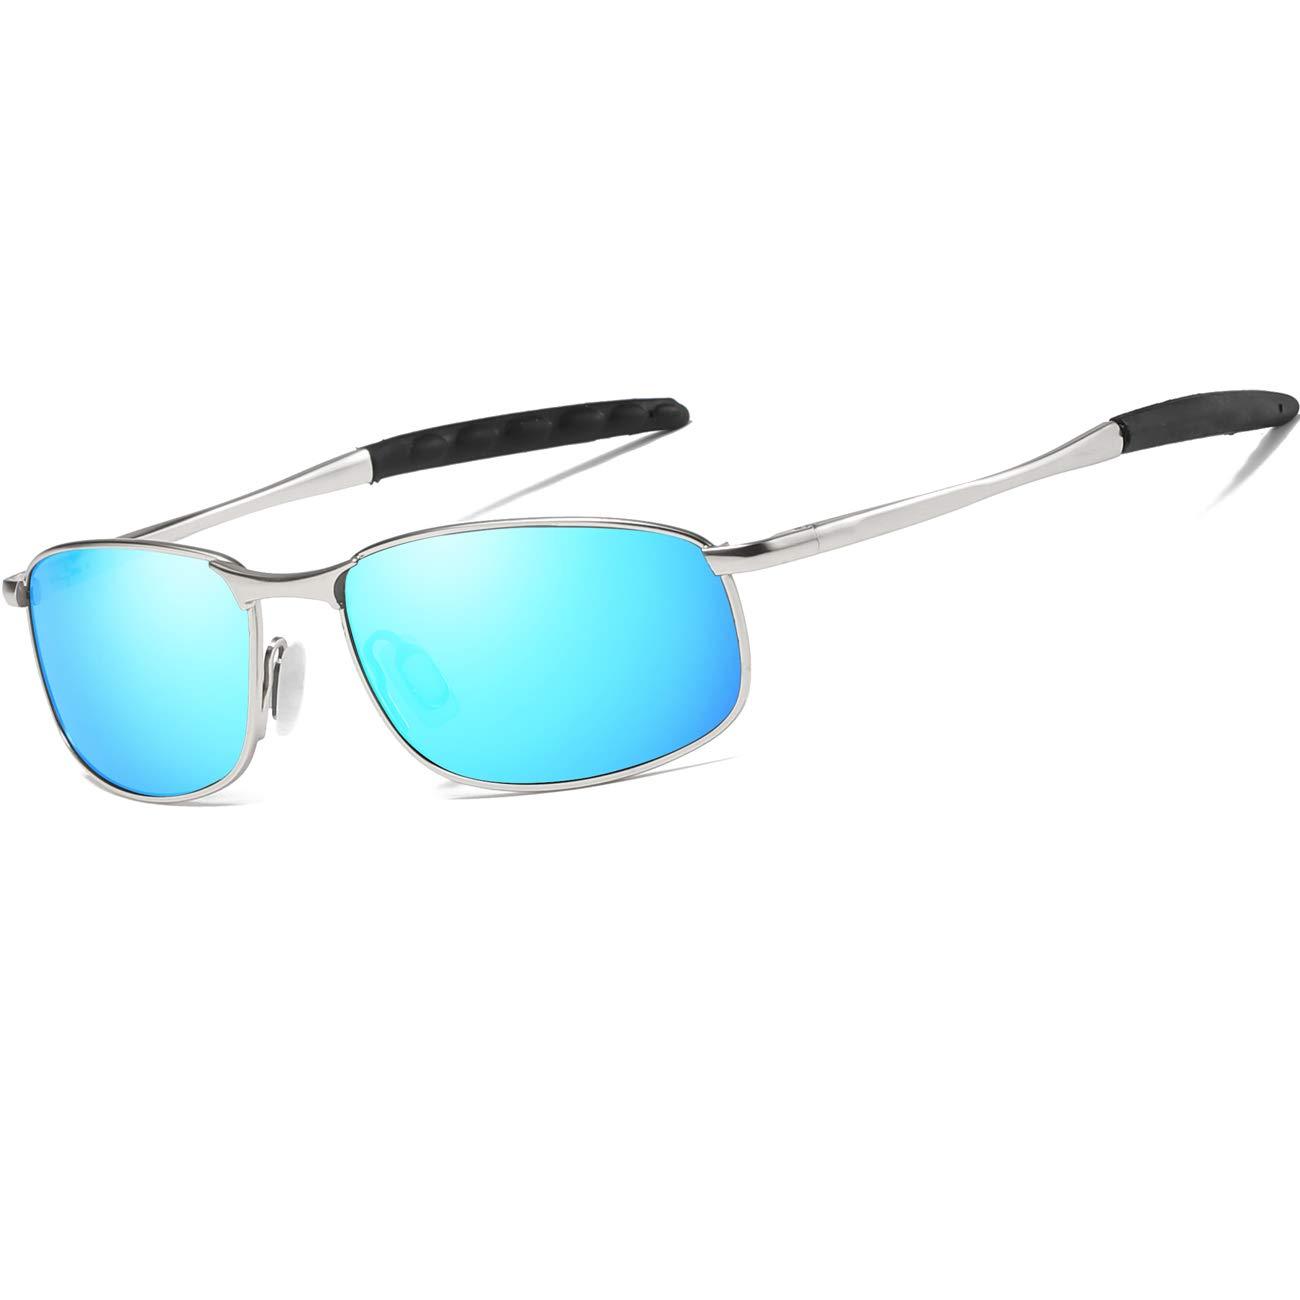 Gbluee FEIDU Mens Polarized Aviator Sunglasses Metal Frame Unisex Sun Glasses FD9001